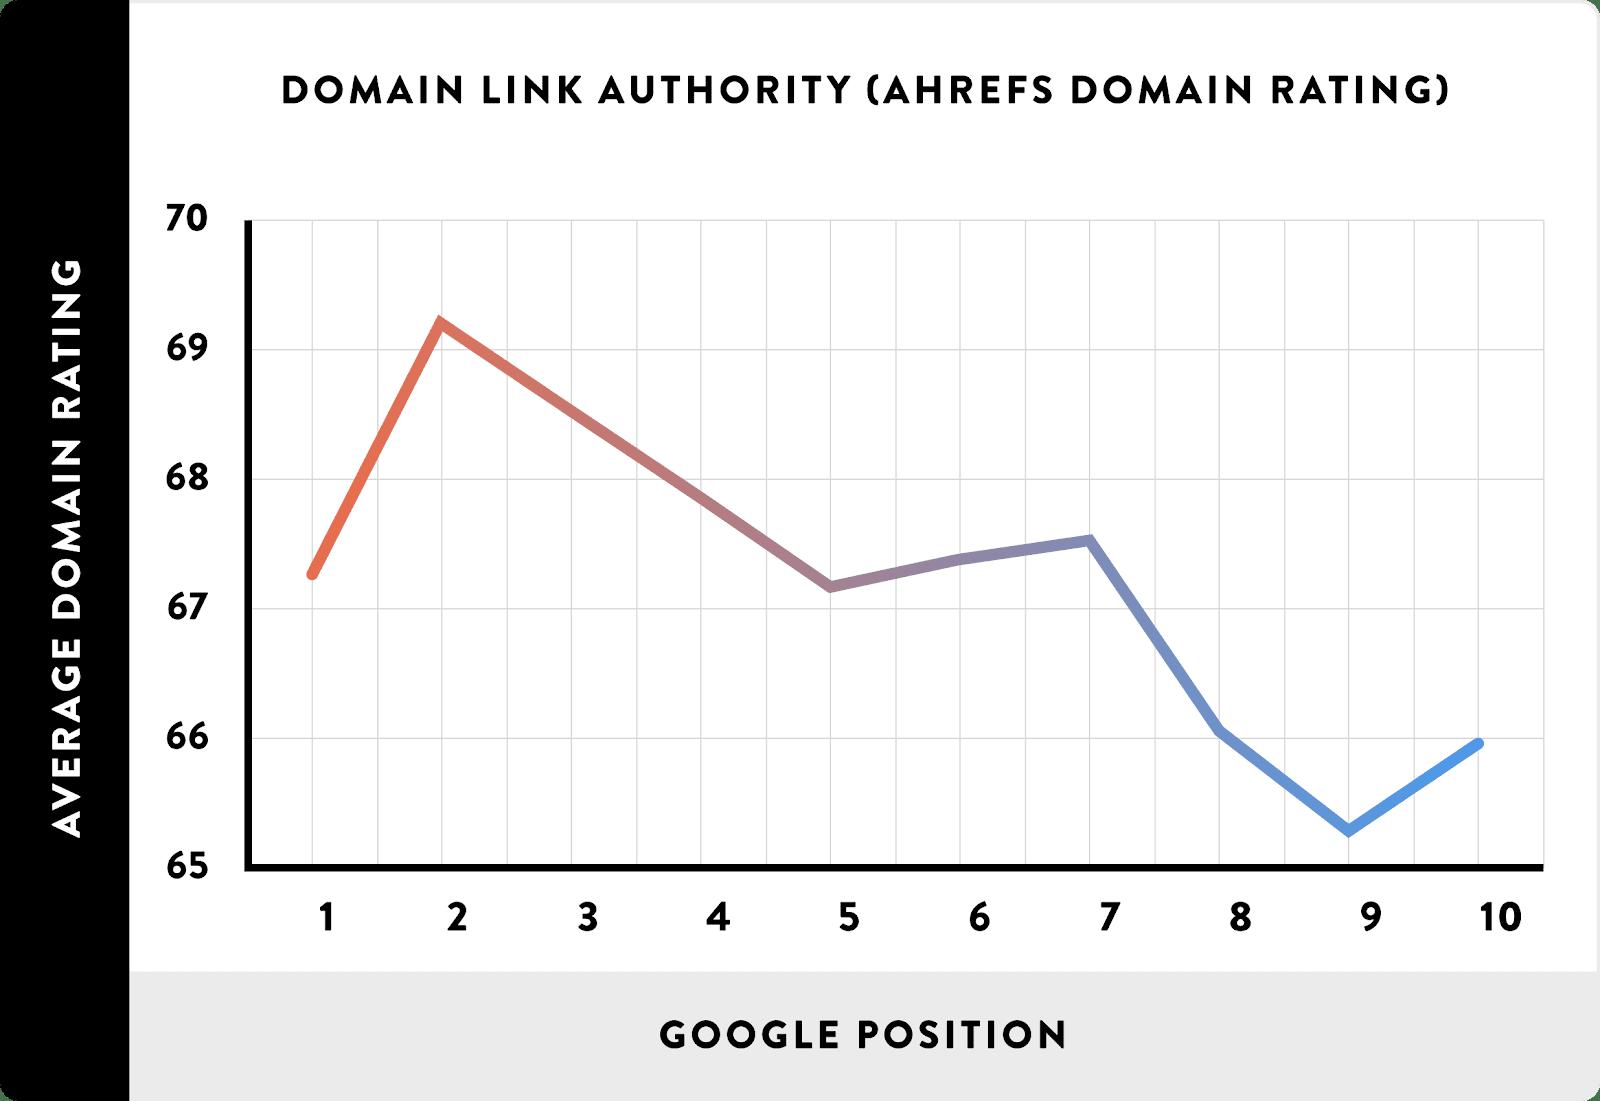 08 Domain Link Authority AHREFs Domain Rating line